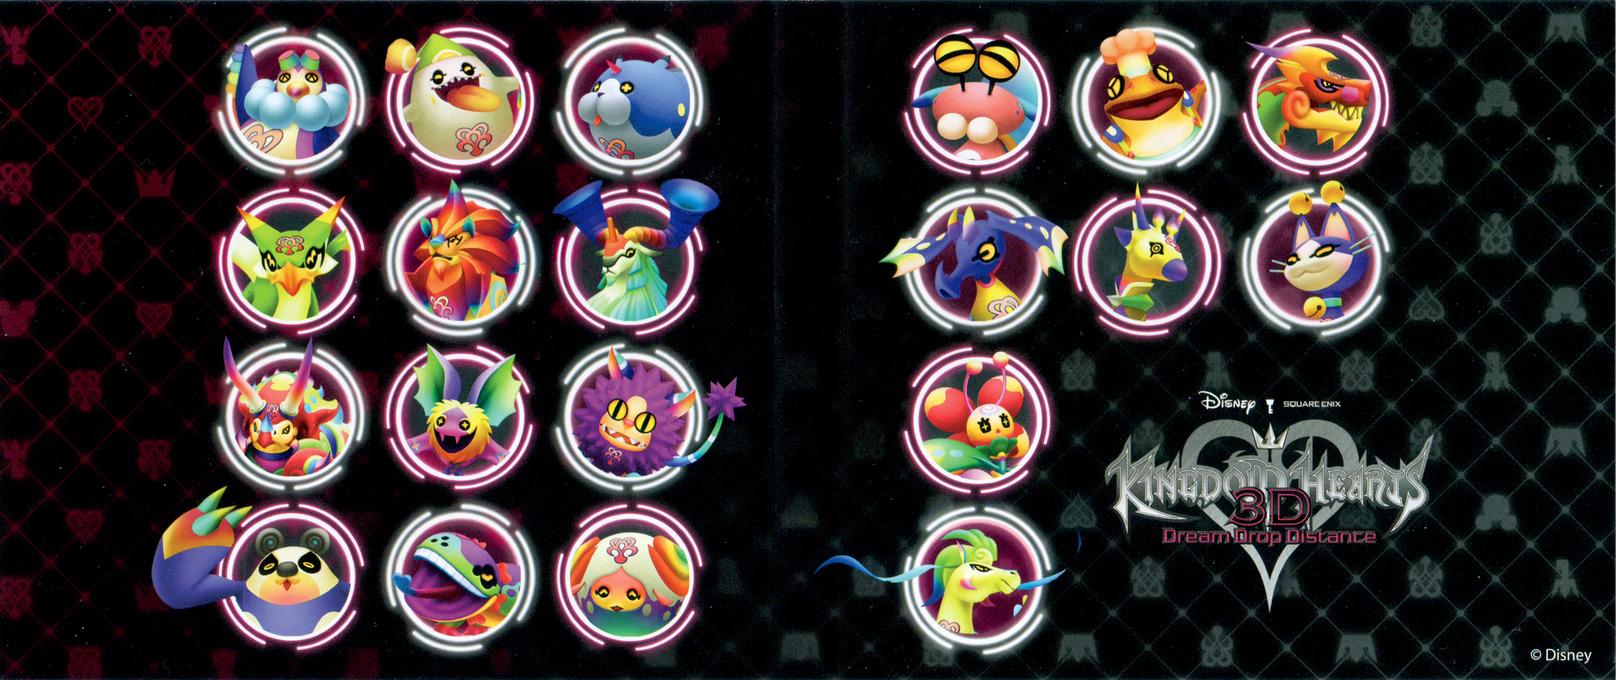 Kingdom Hearts 3D - Dream Drop Distance 3DS coverfullHQB (AKHE)